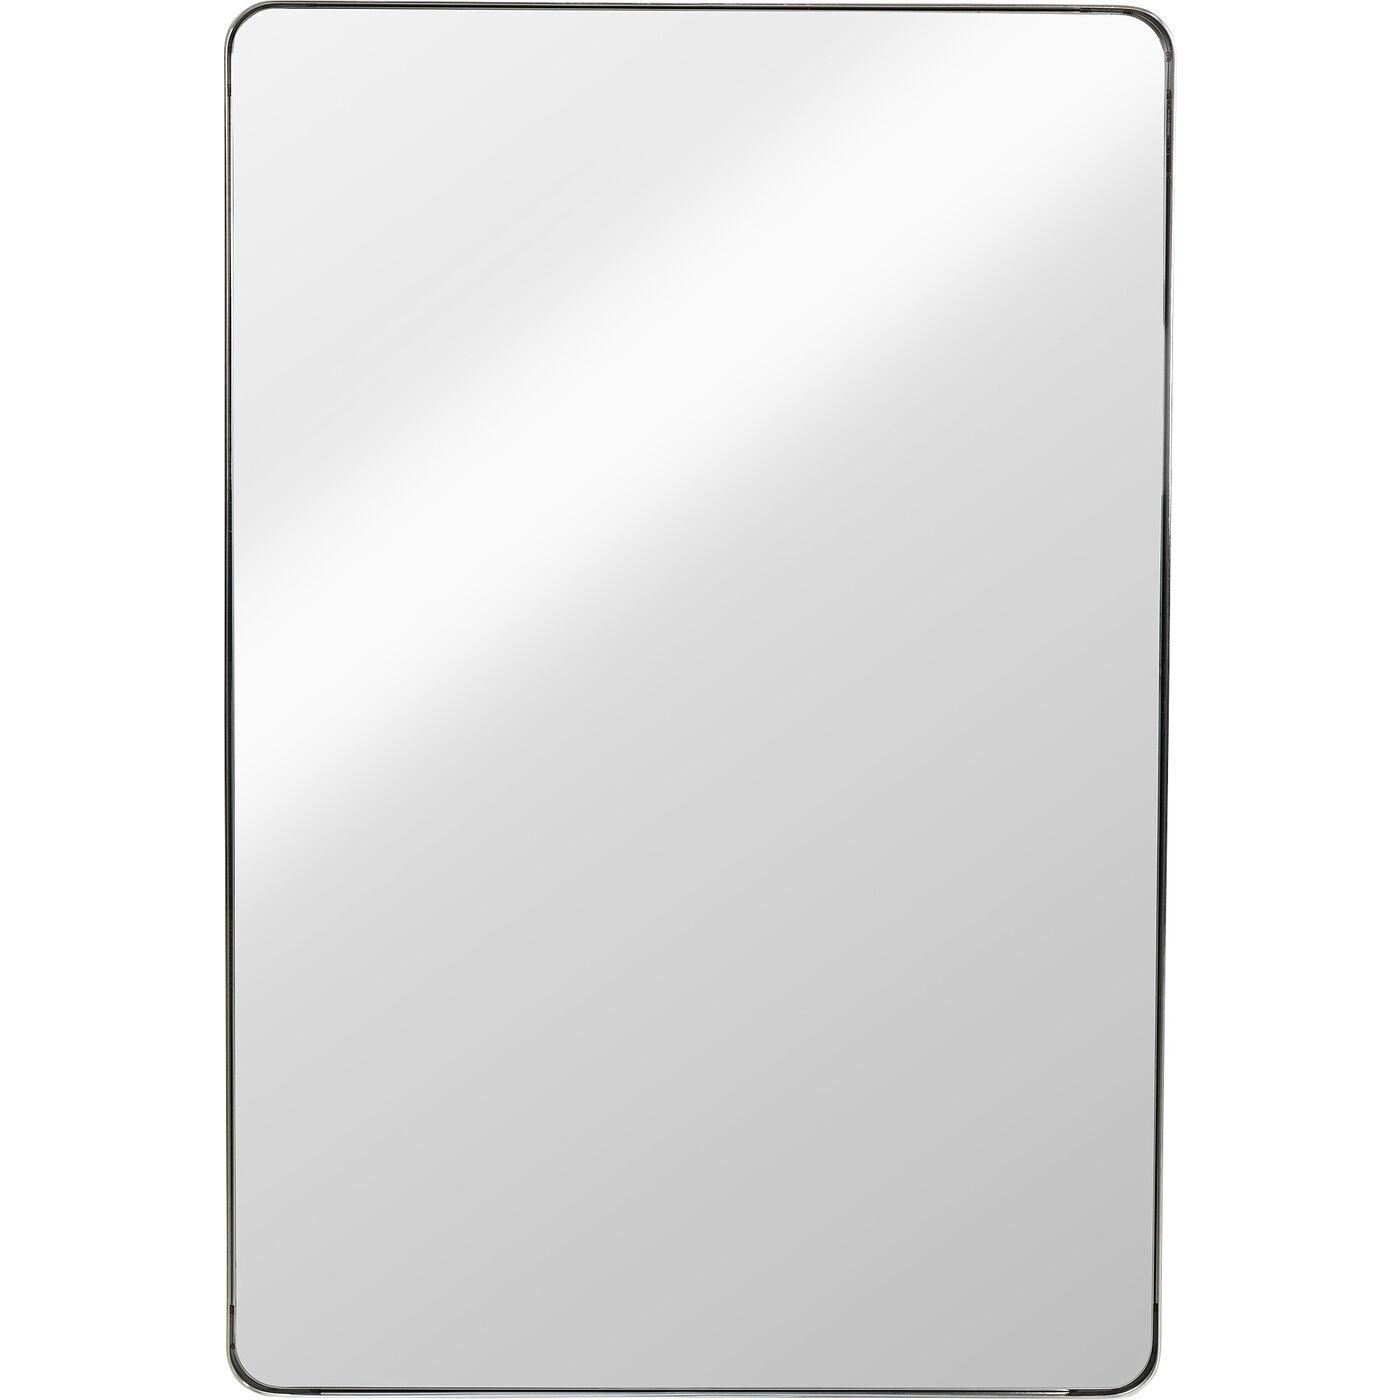 Spiegel Curve MO Chrom Look 120x80